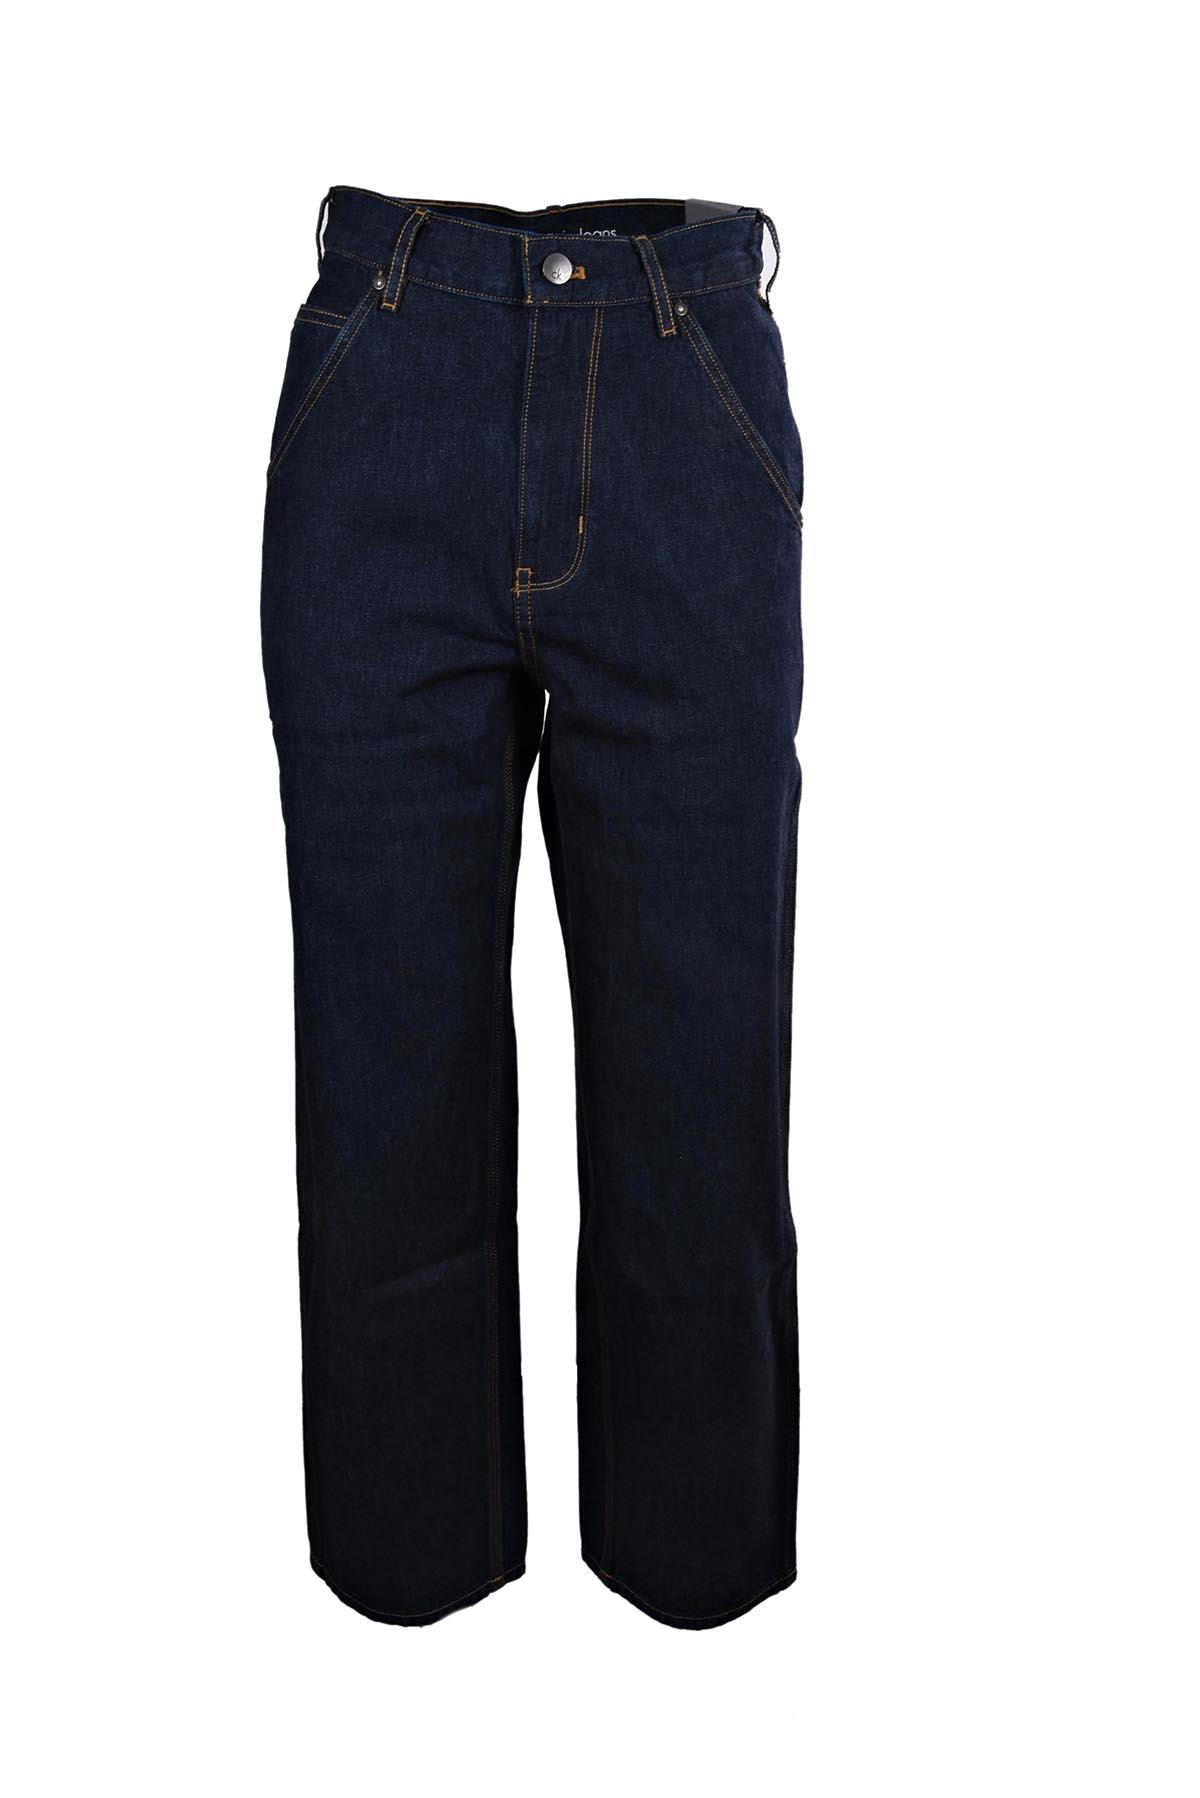 Calvin Klein Jeans Pant